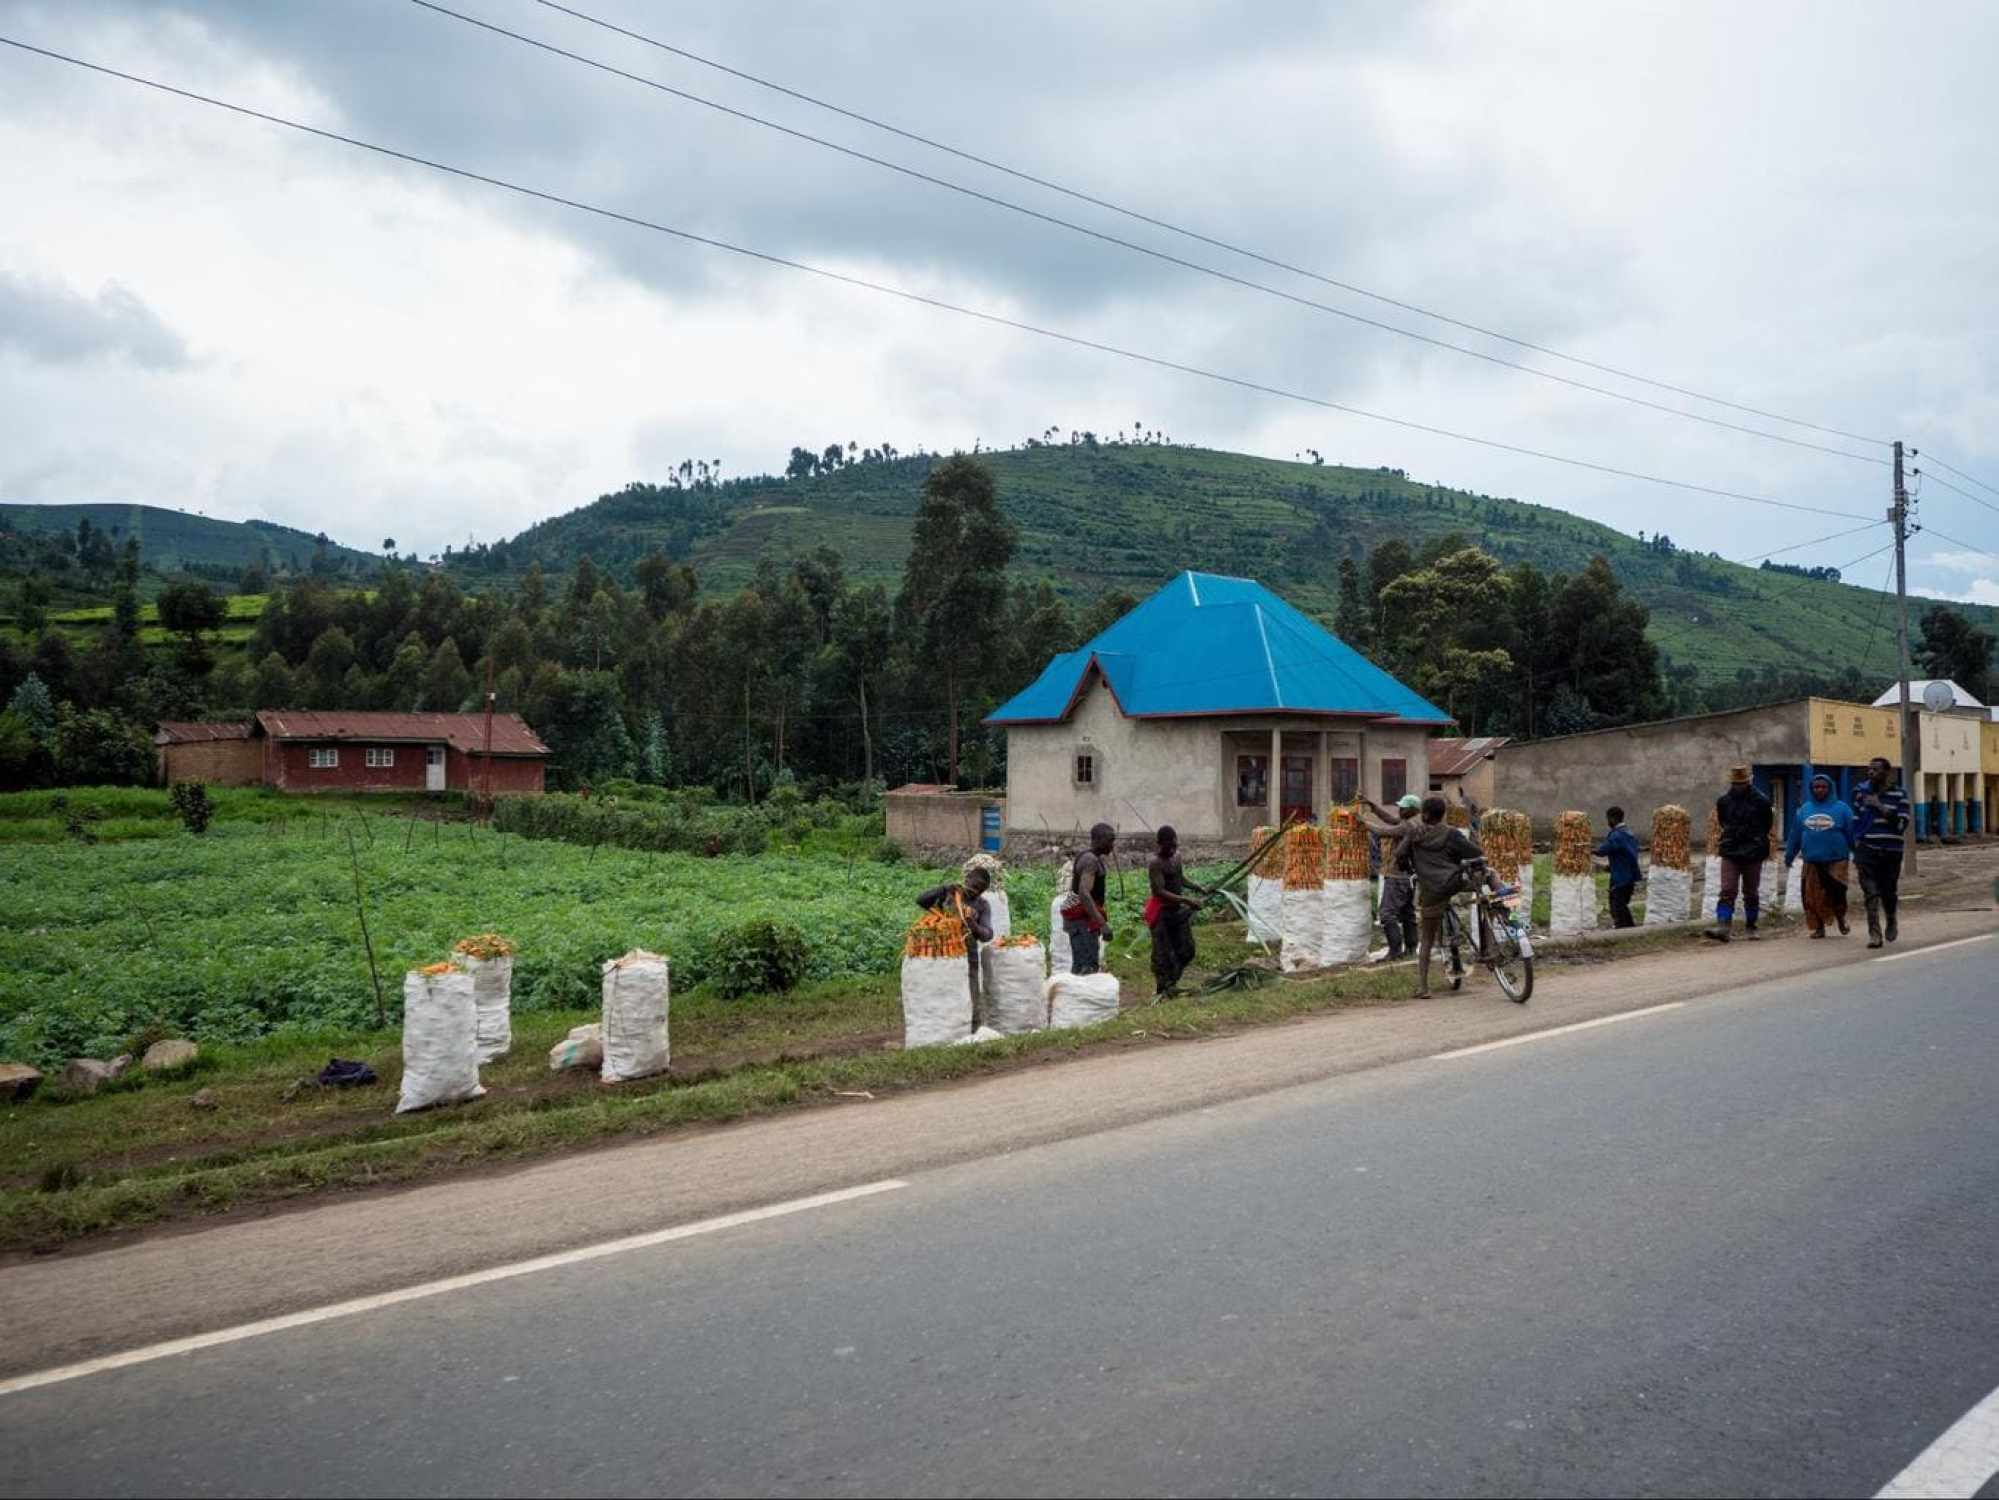 The great infrastructure in Rwanda